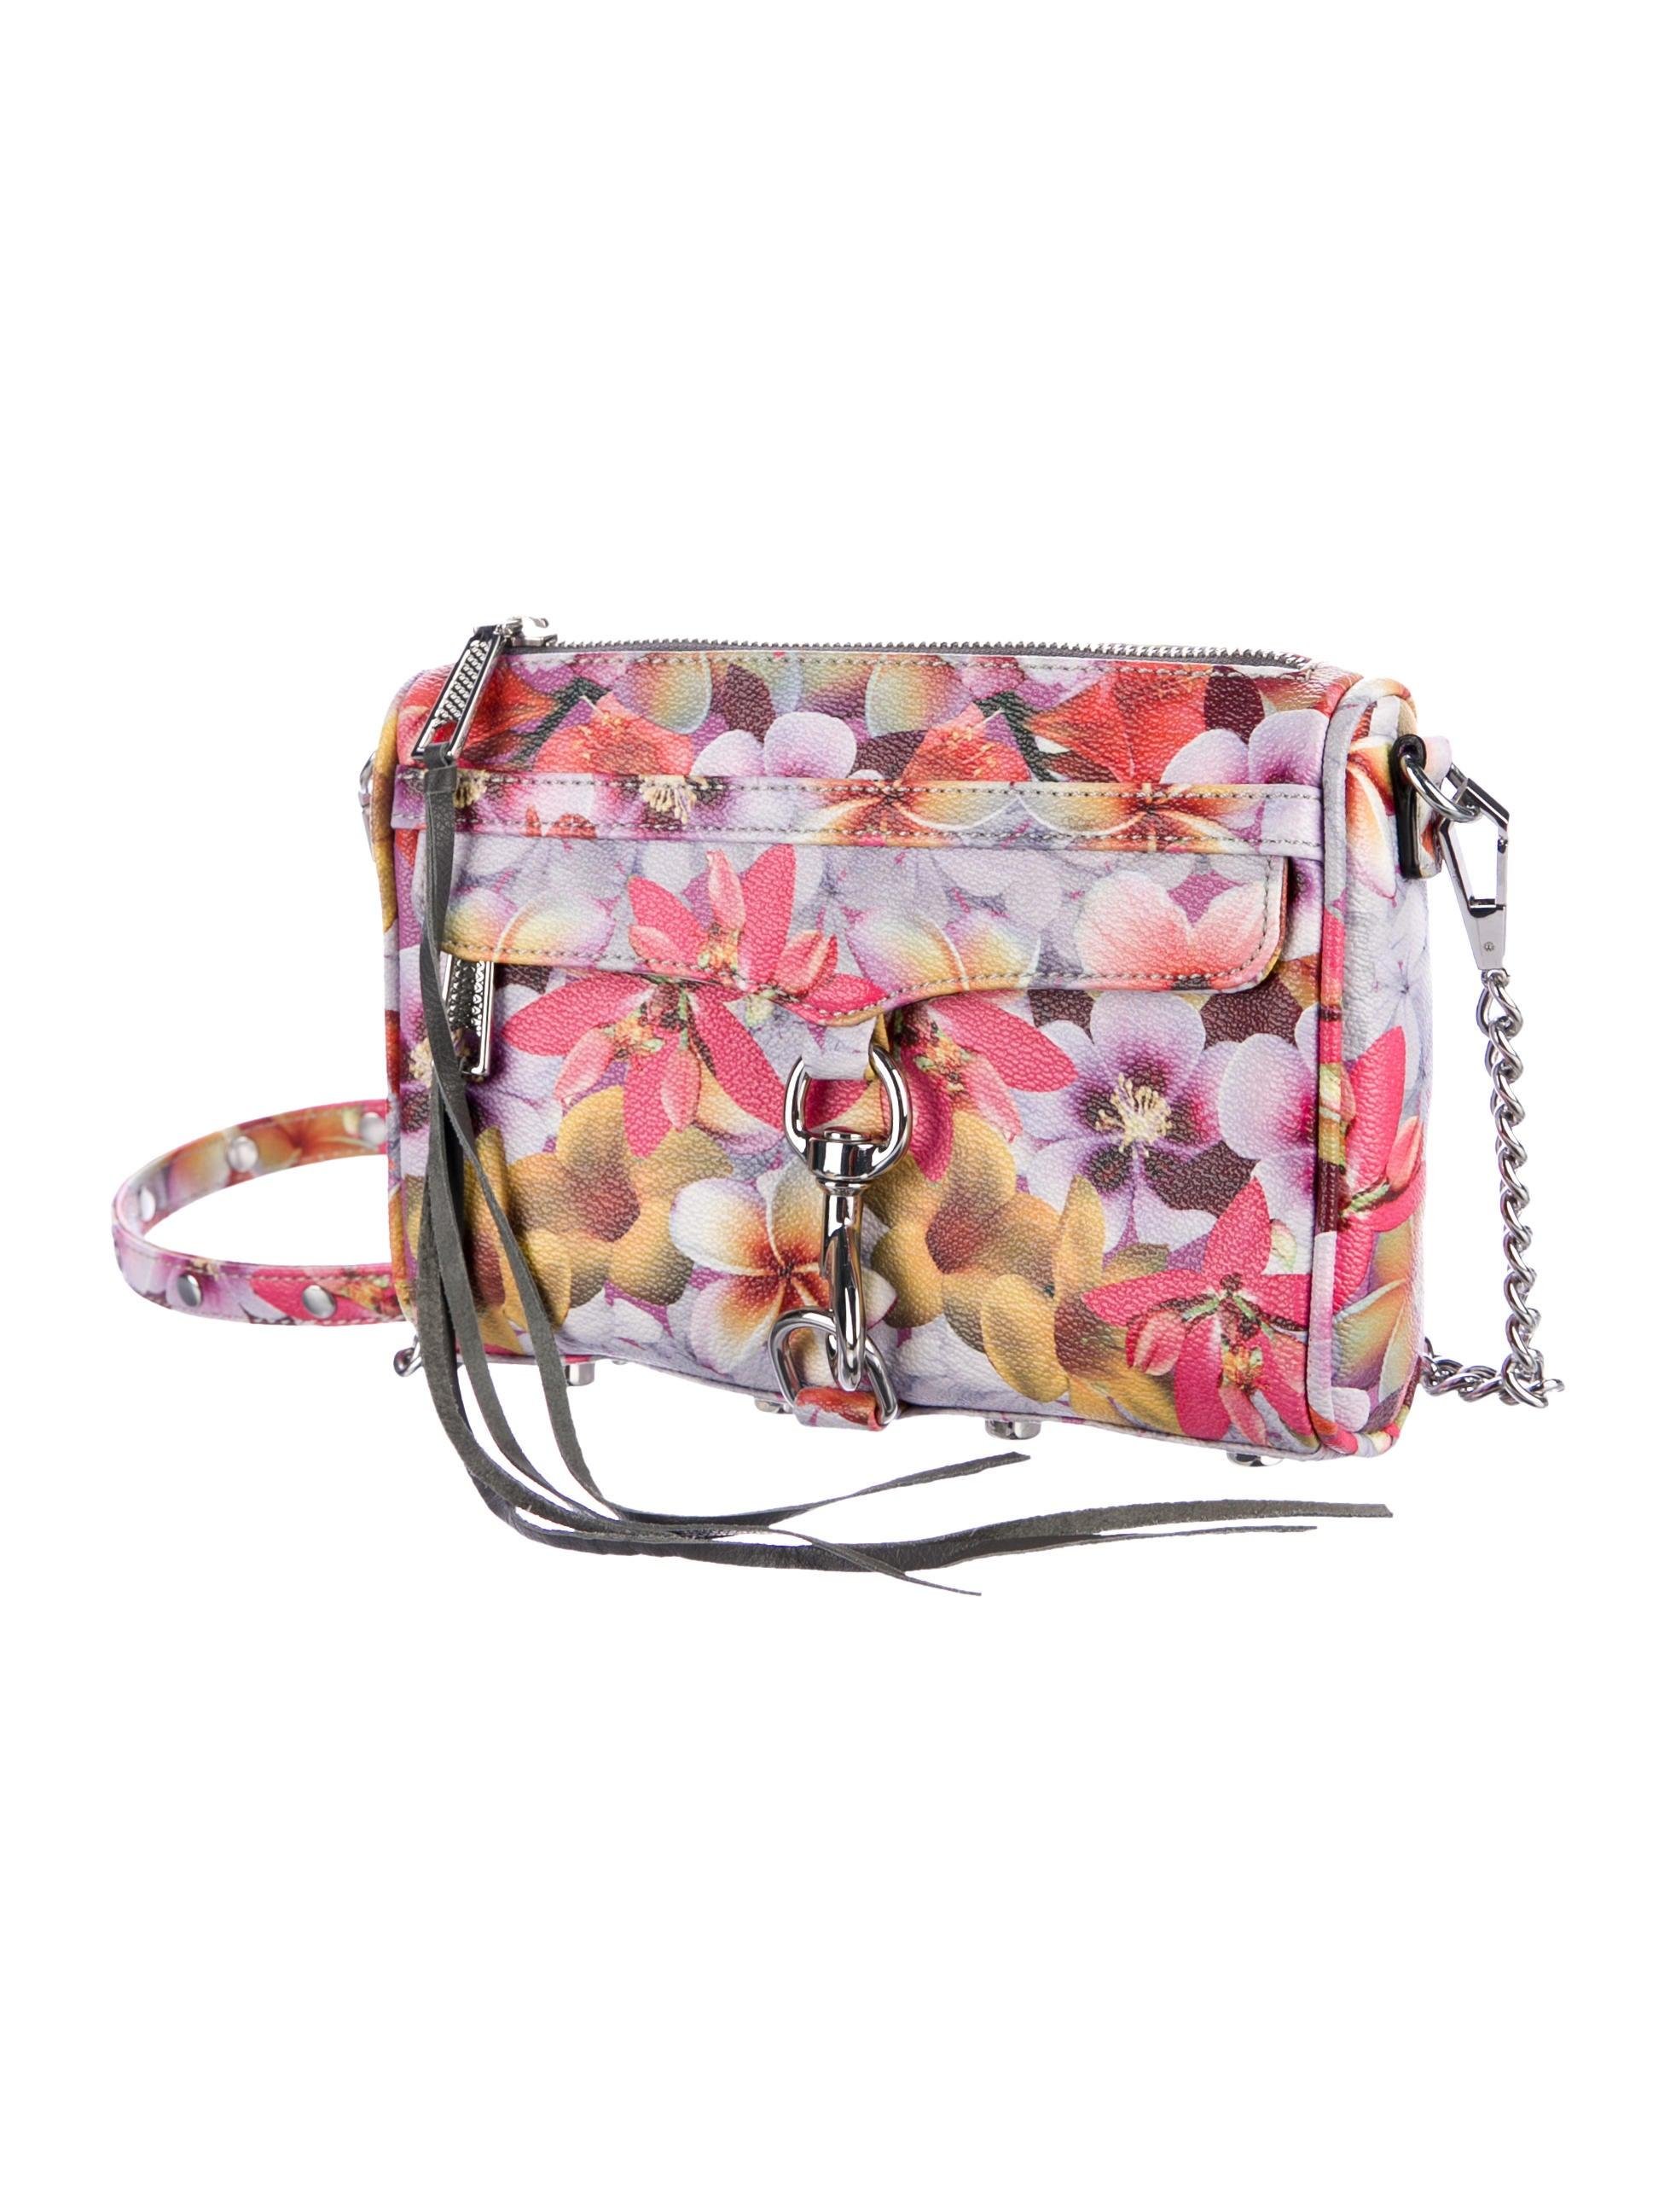 Rebecca Minkoff Floral Printed MAC Crossbody Bag - Handbags - WRM32190 | The RealReal